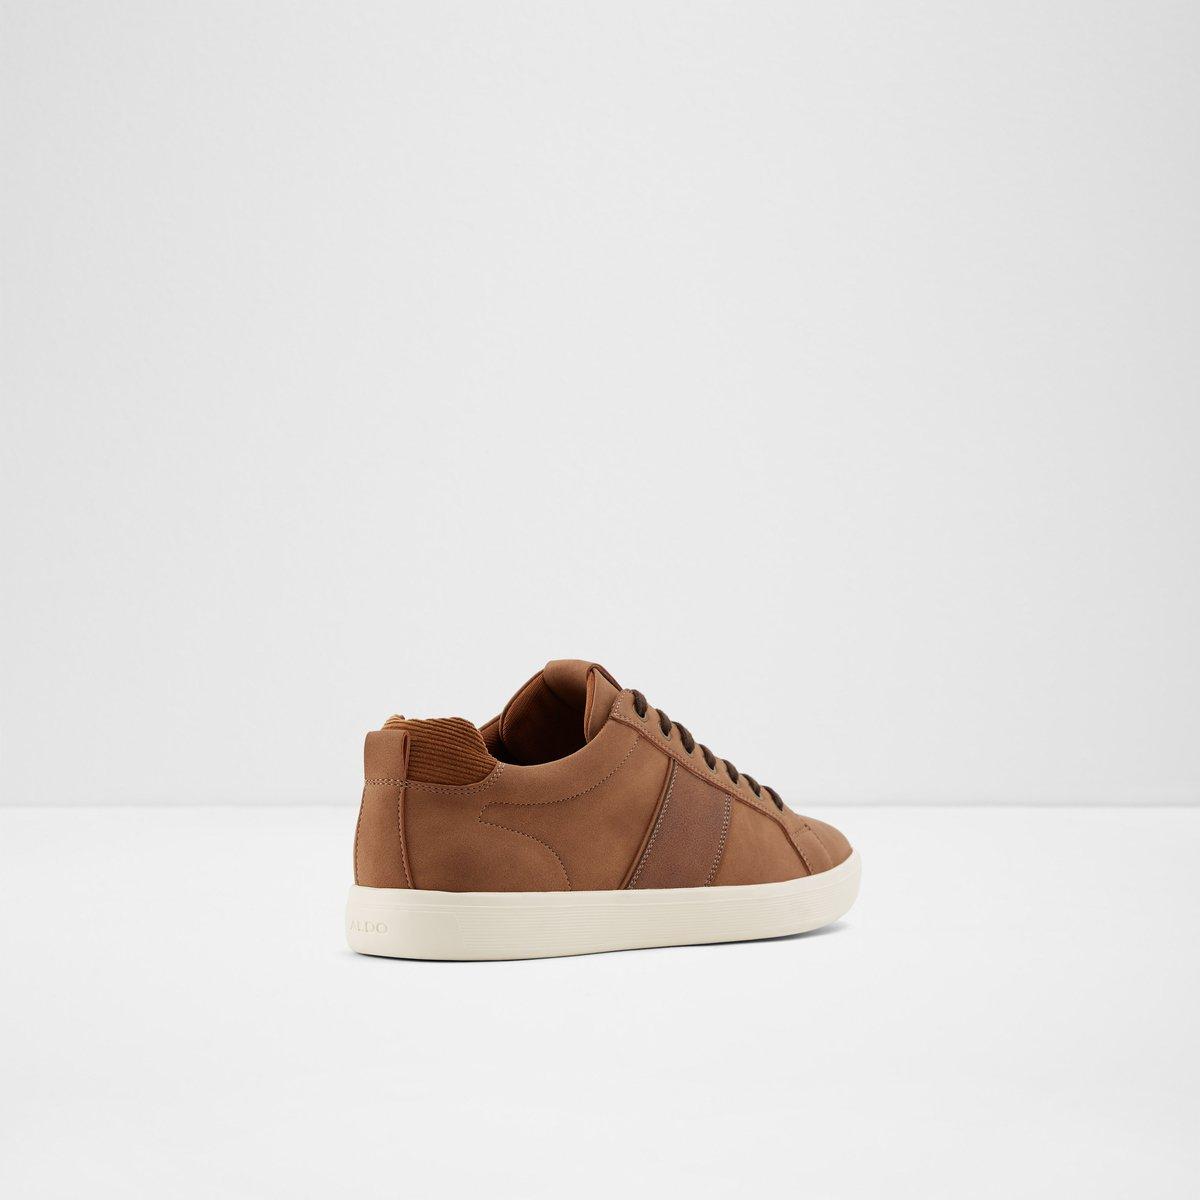 Lovericia Medium Brown Men's Sneakers